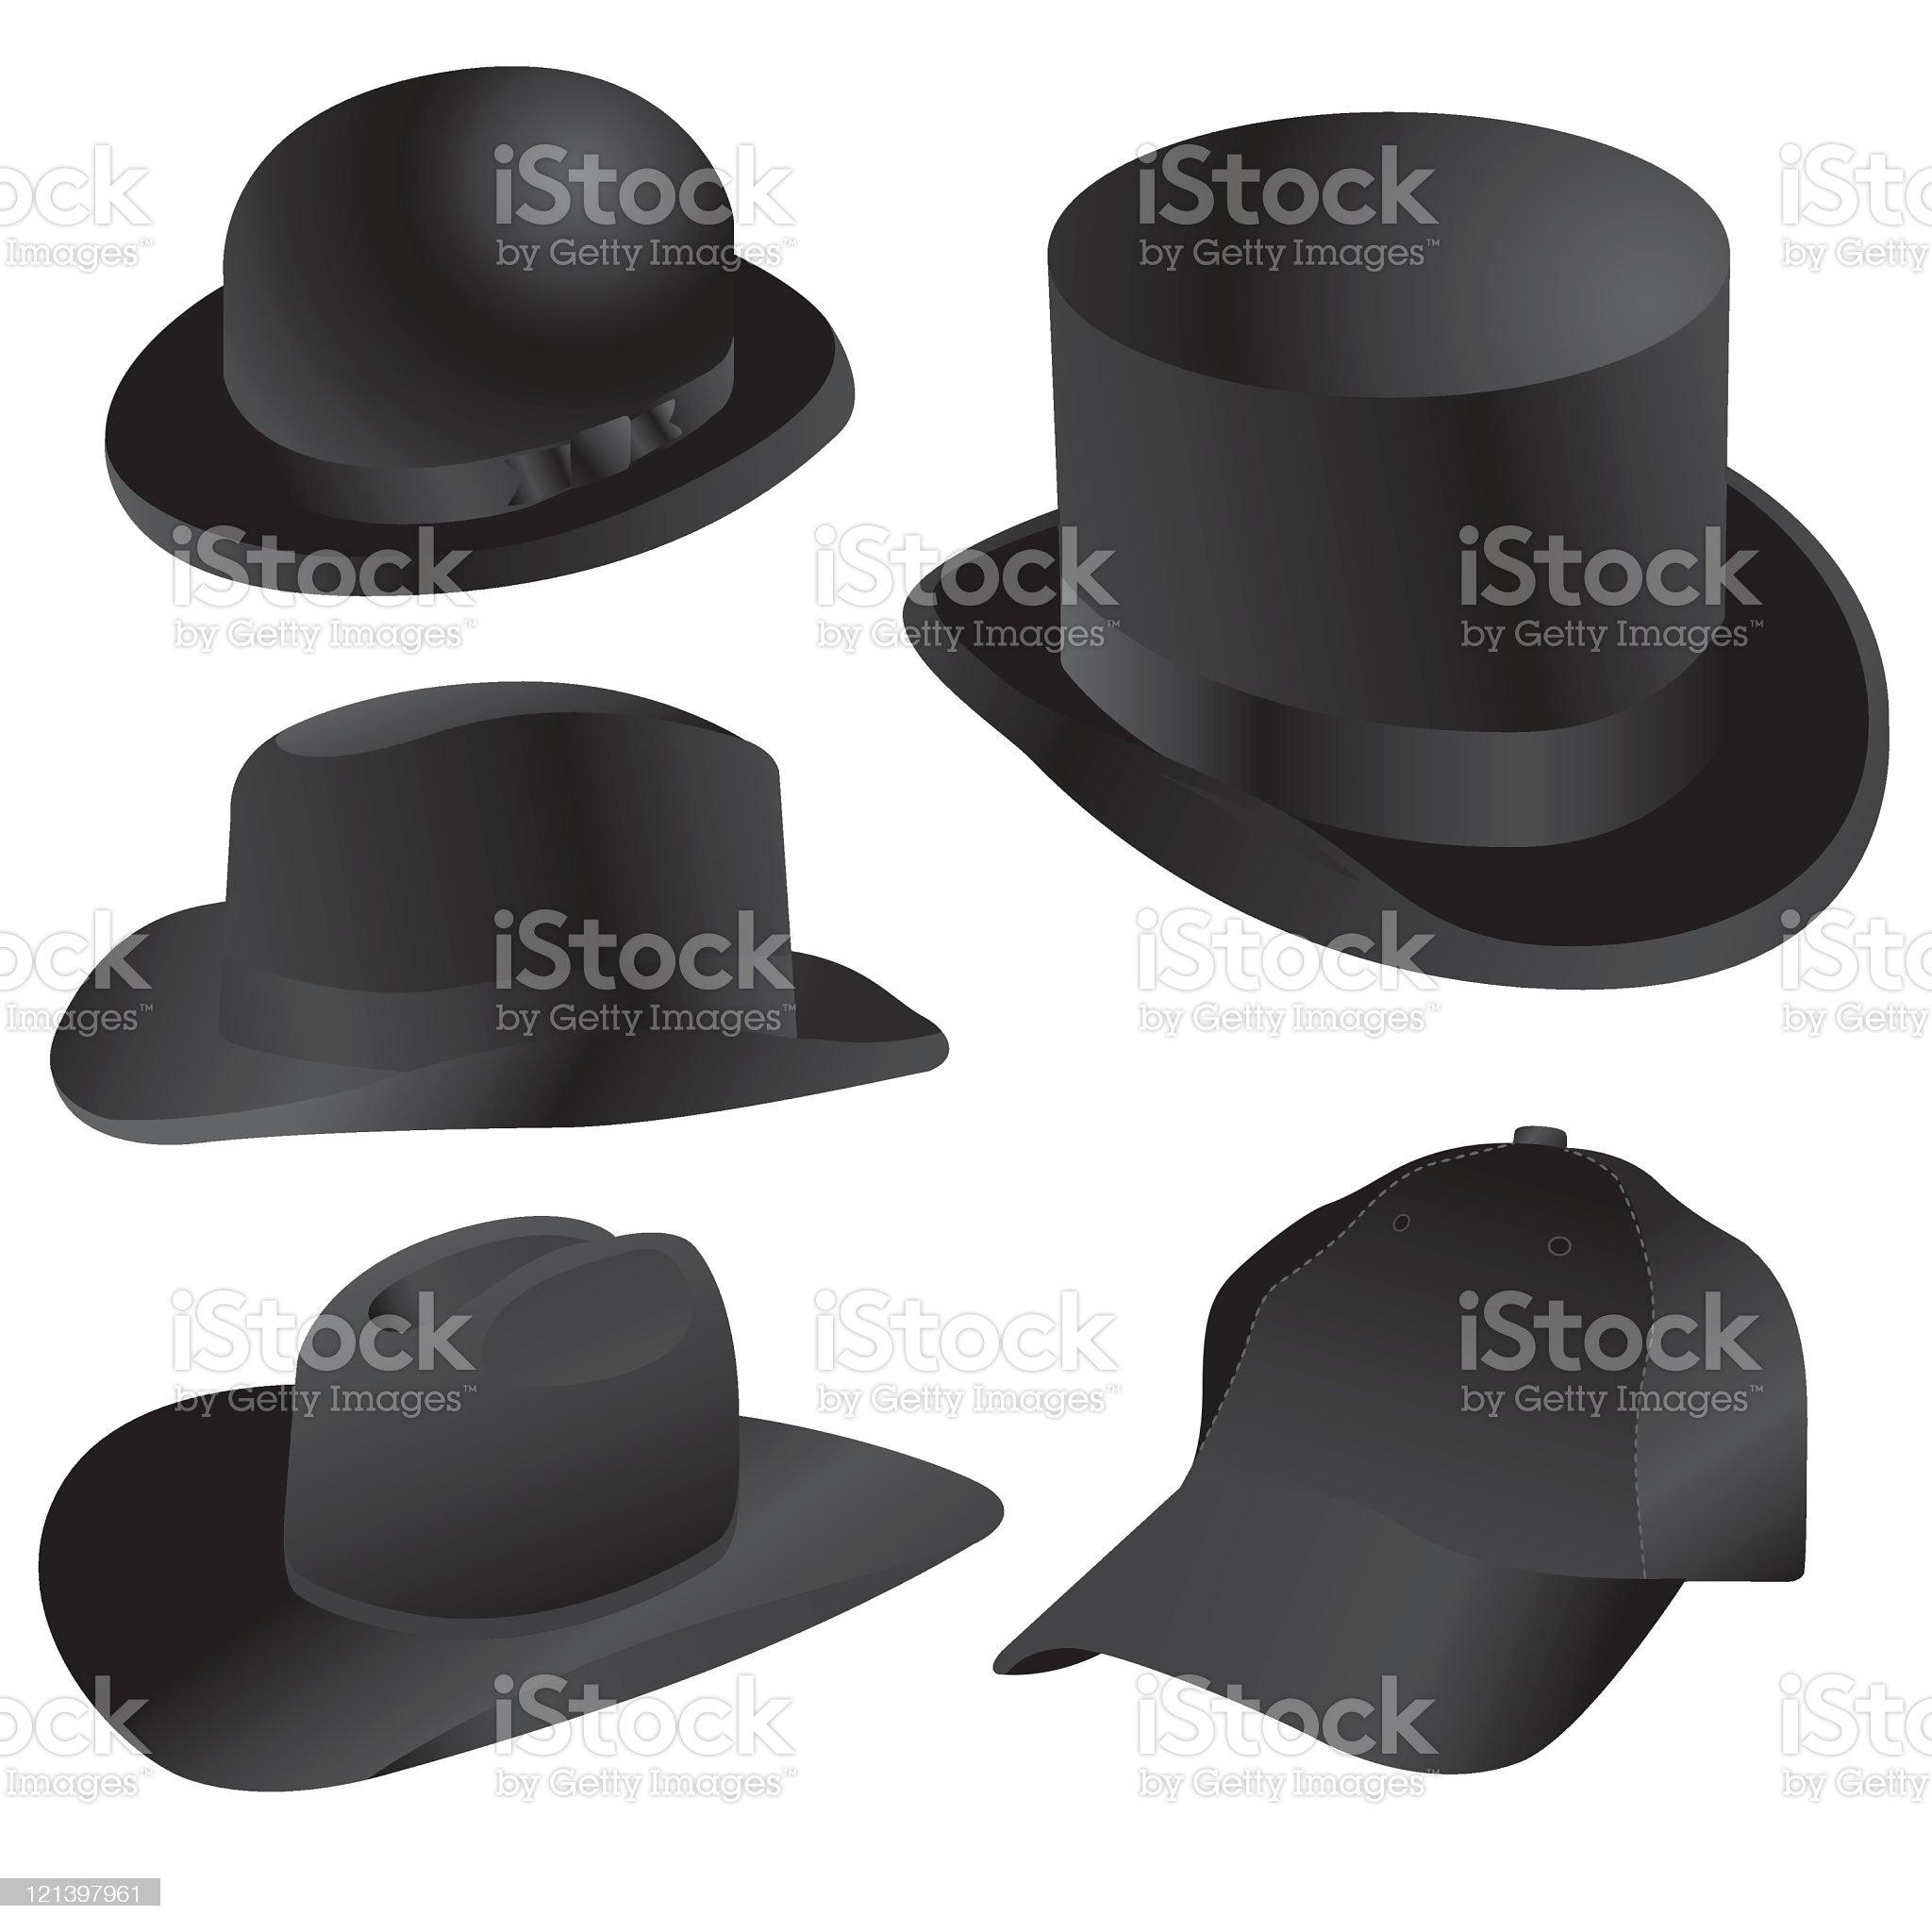 Classic Hats royalty-free stock vector art